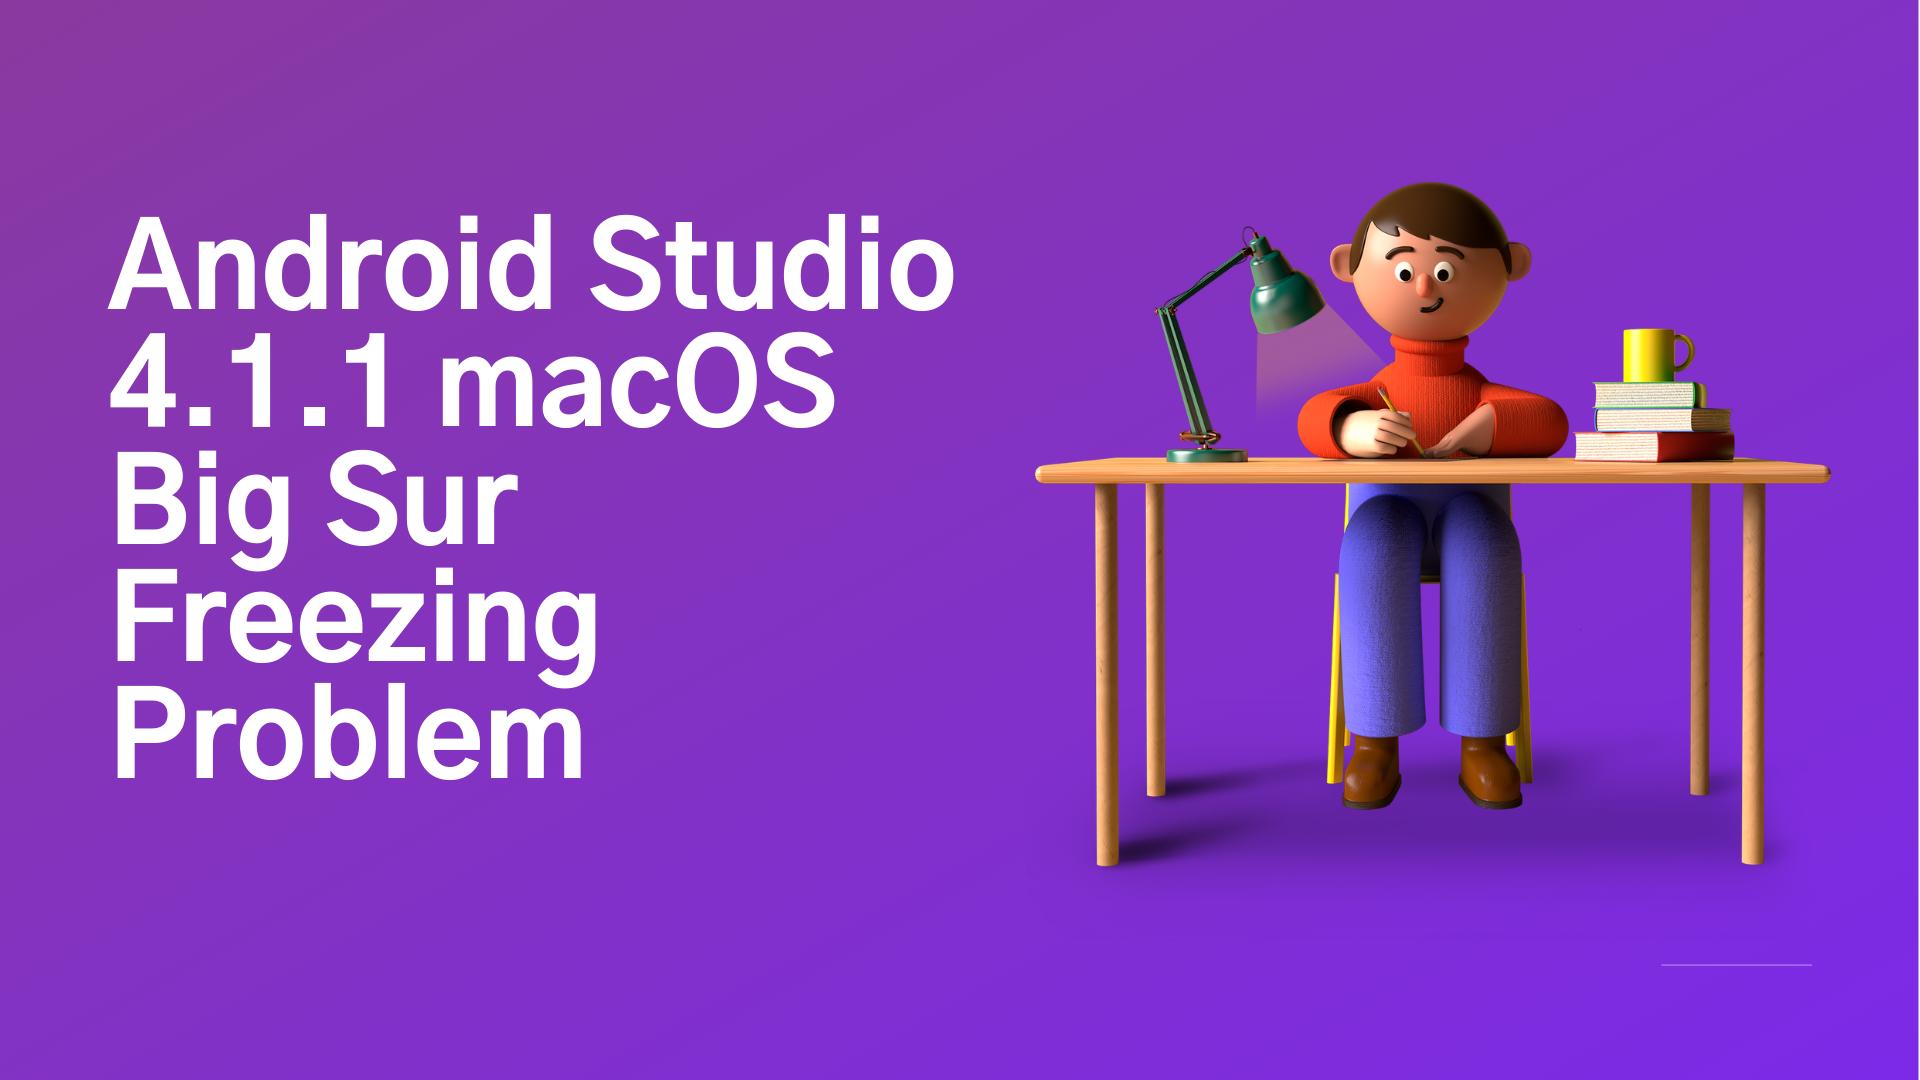 Android Studio 4.1.1- MacOS BigSur - Freezing Problem in FullScreen